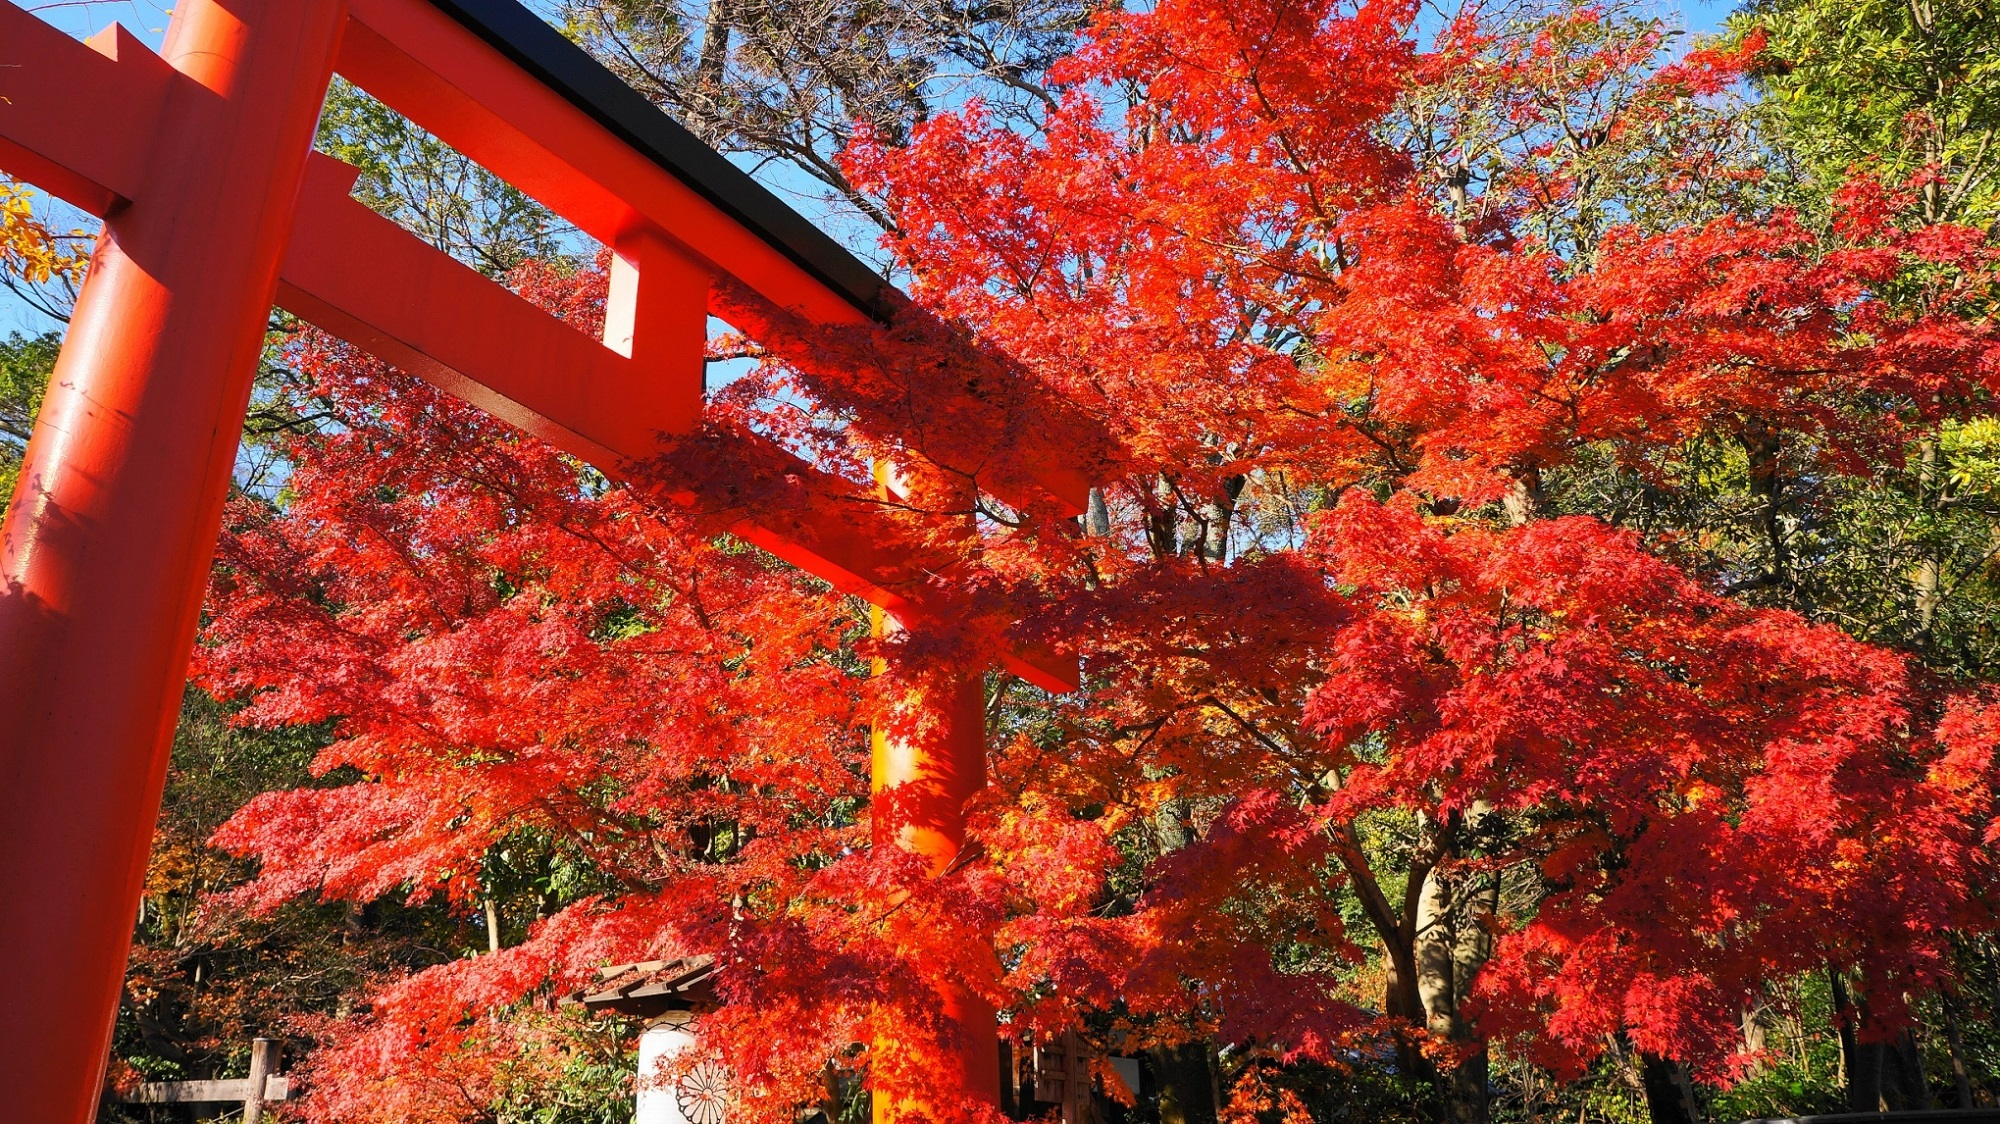 下鴨神社 紅葉 京都で一番遅い紅葉